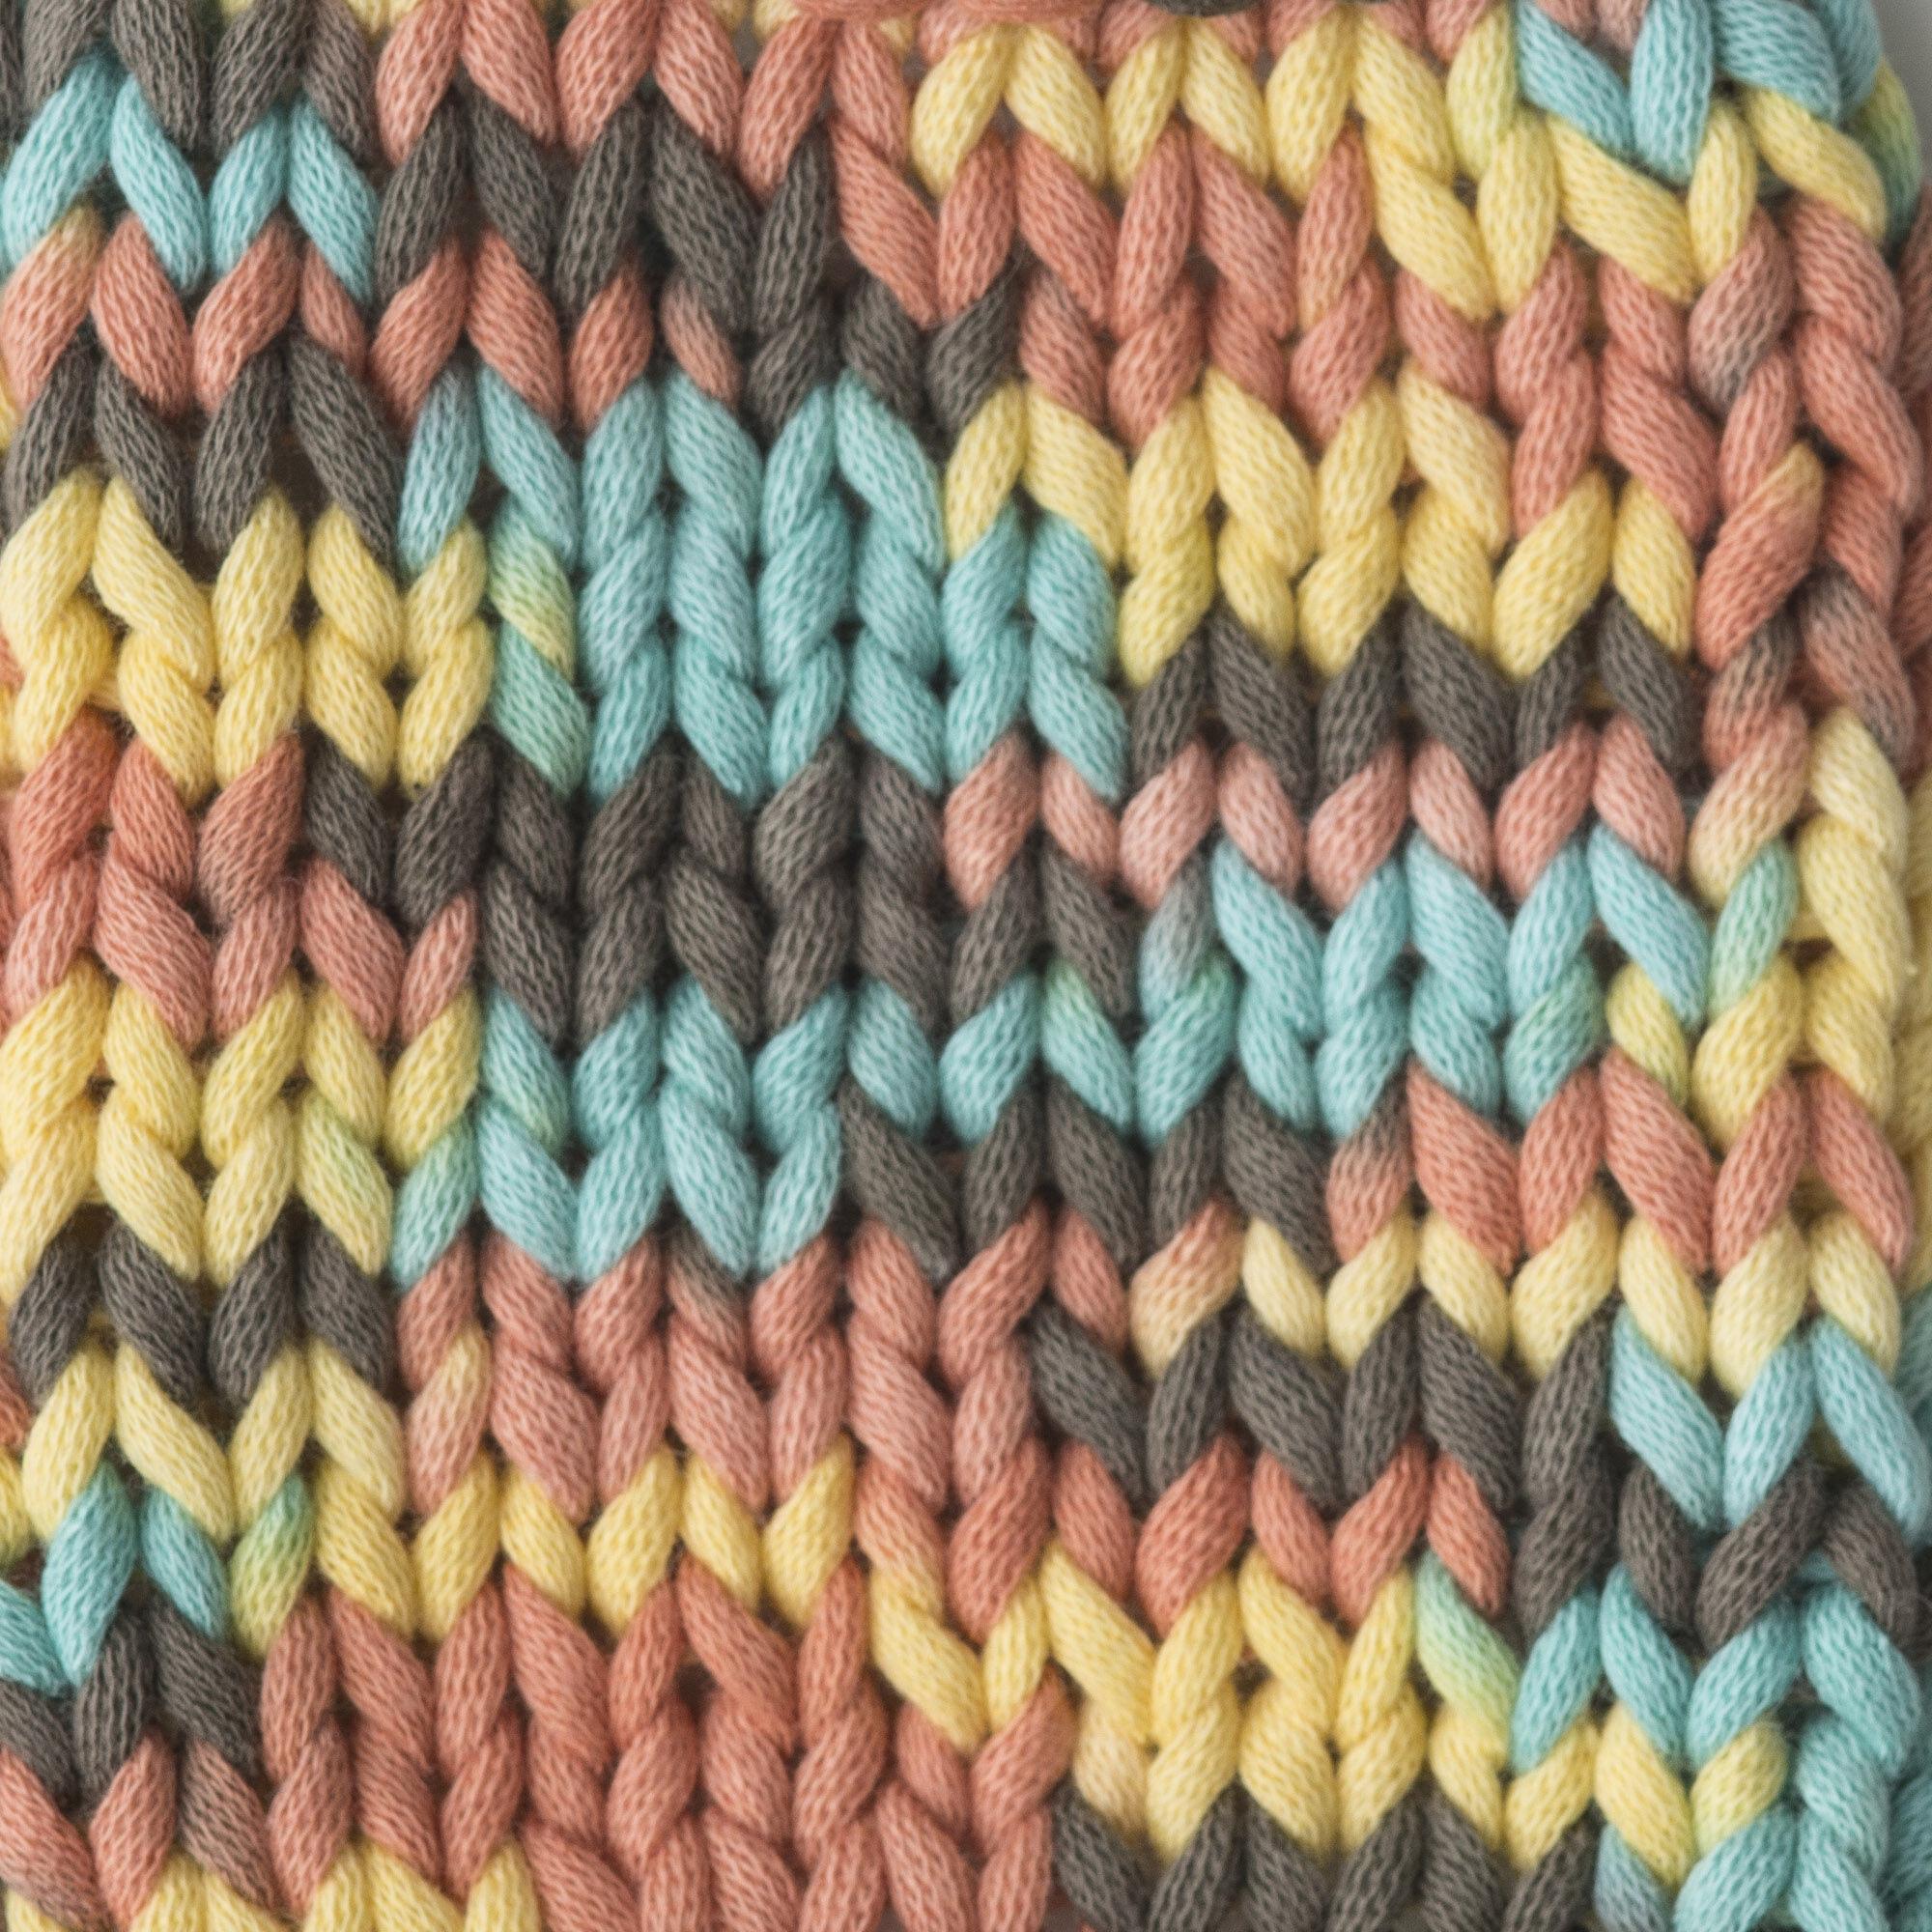 Bernat Maker Home Dec Yarn, Sunset Sea Varg | Yarnspirations